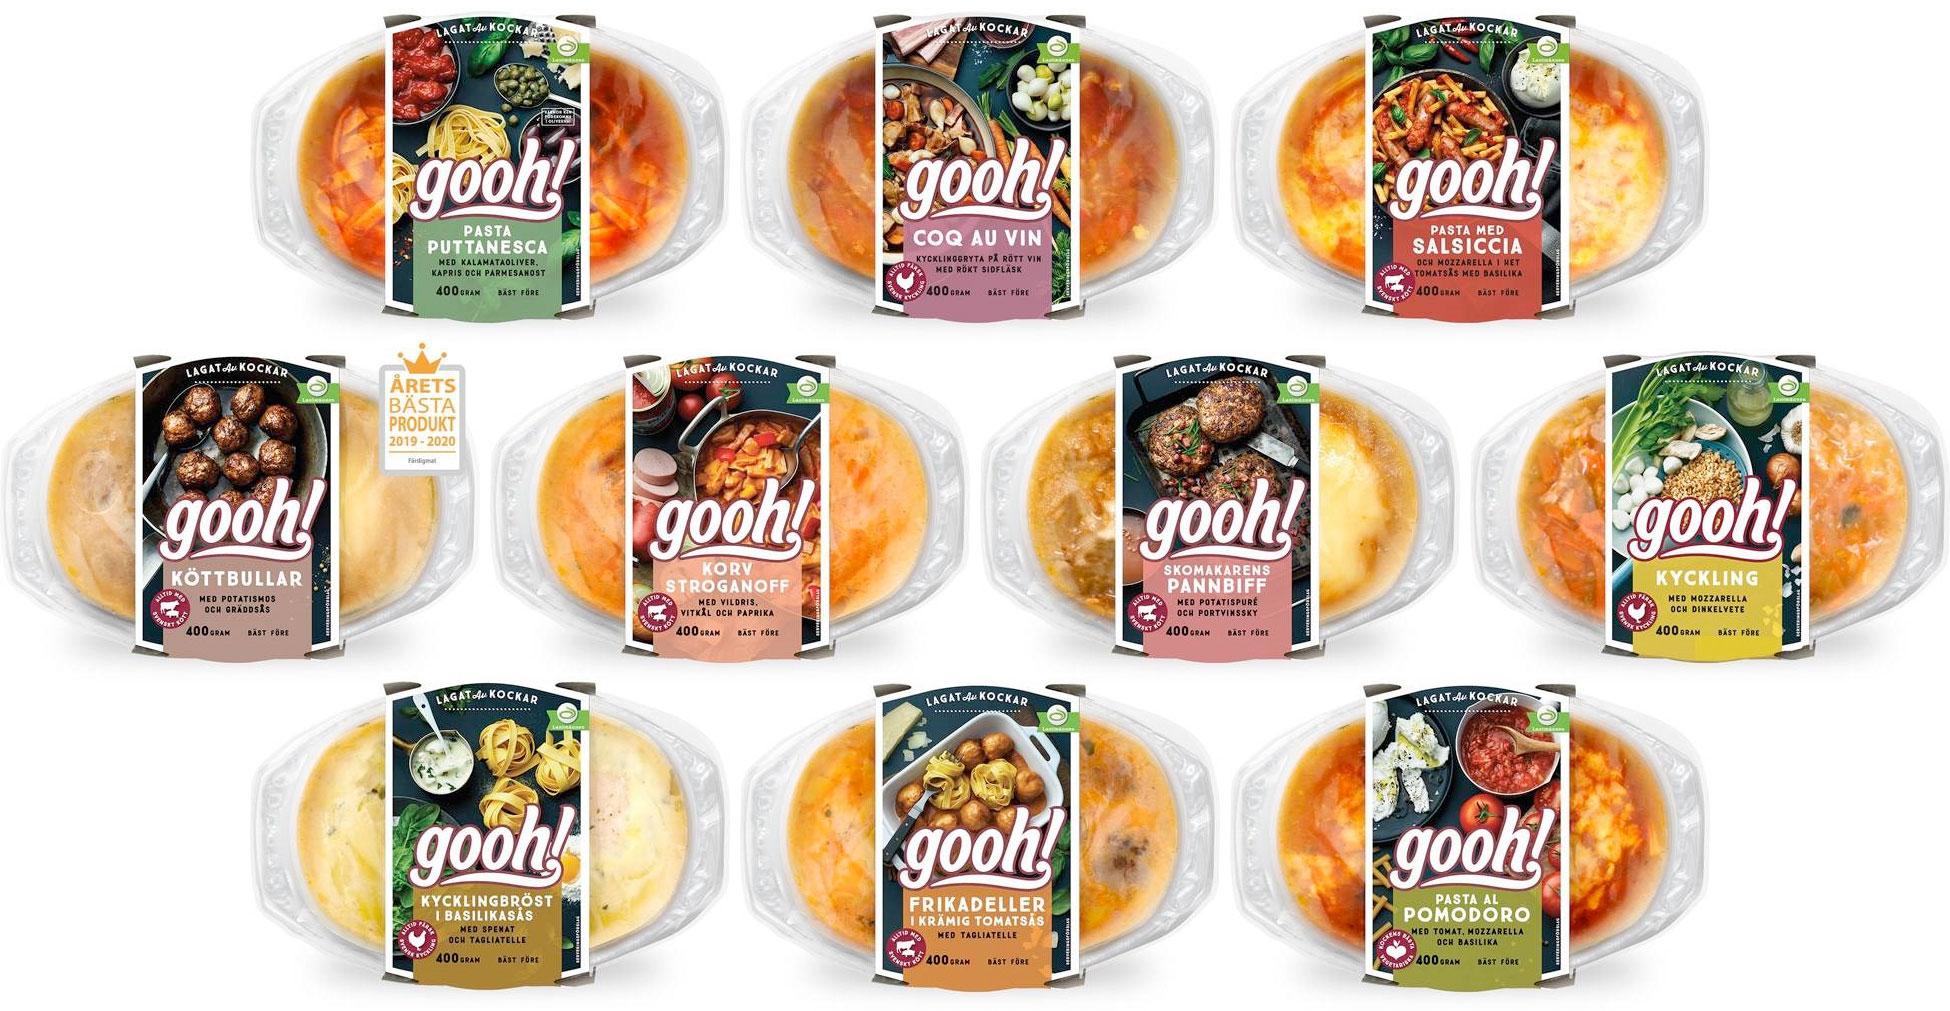 Gooh products